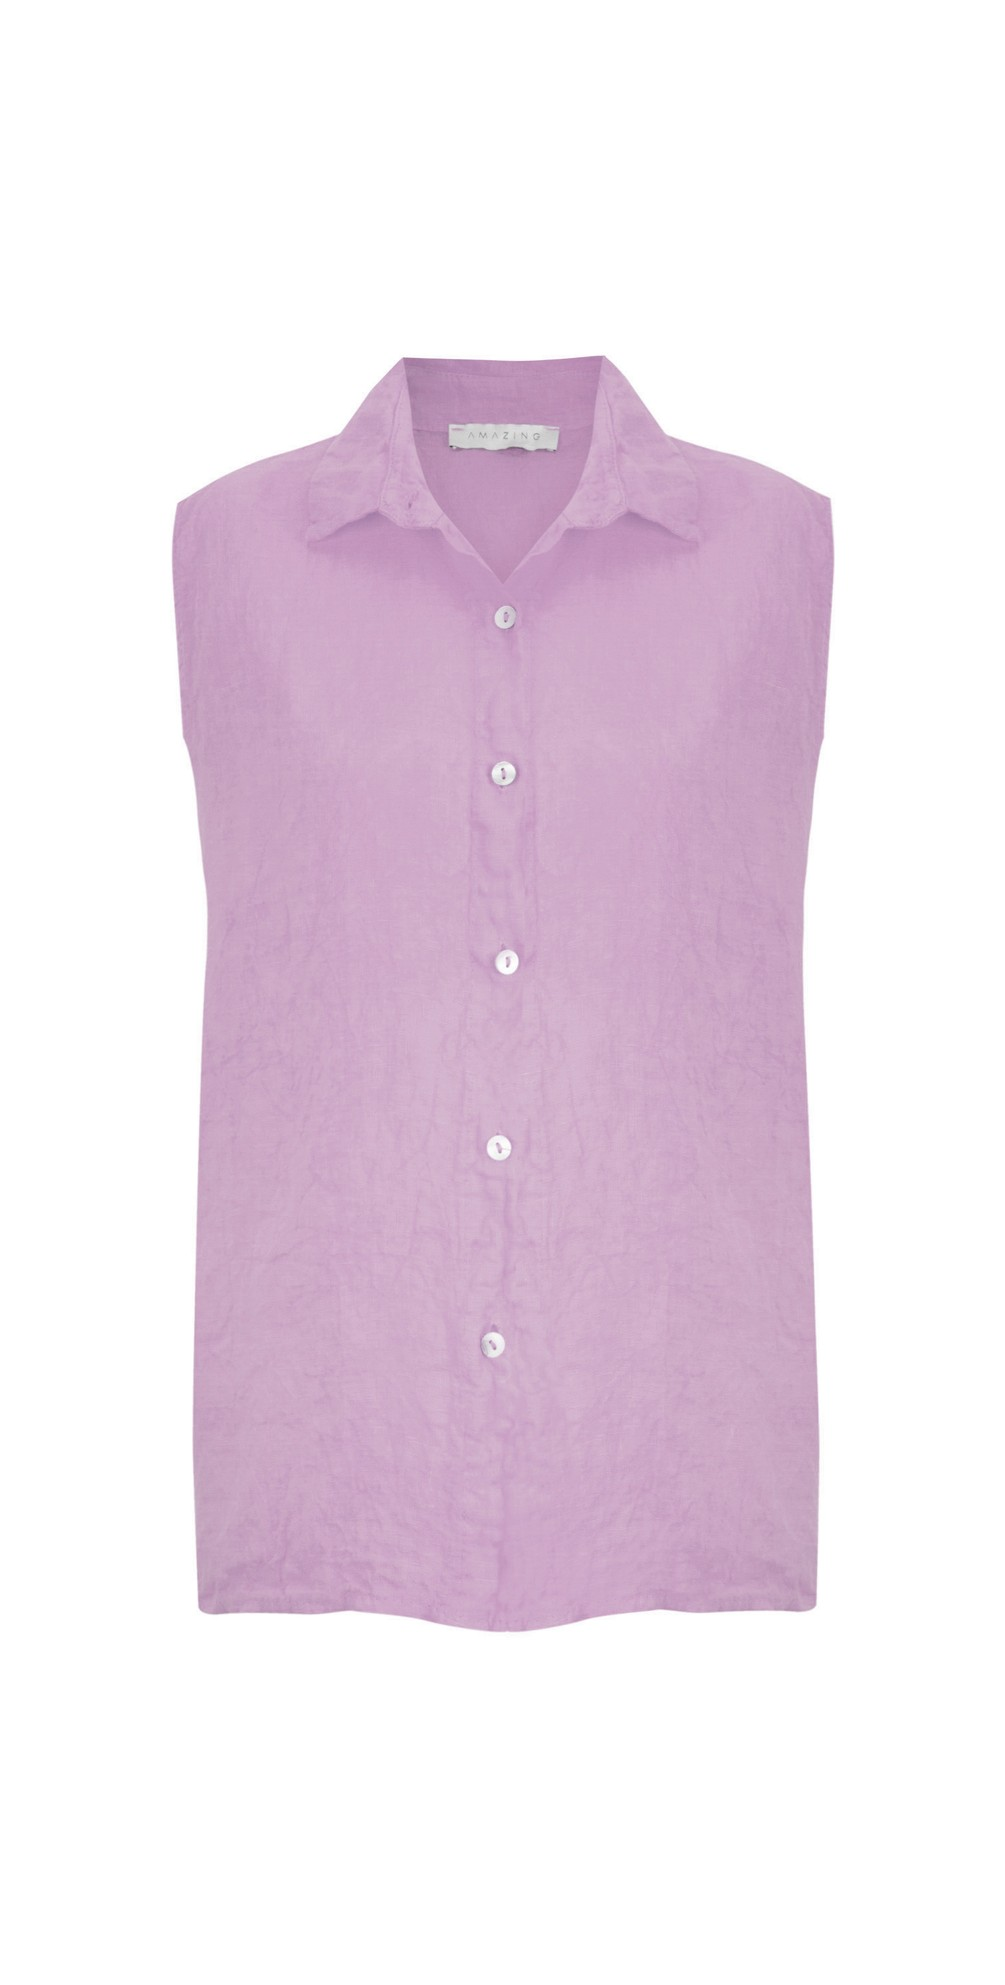 Steffi Shirt main image